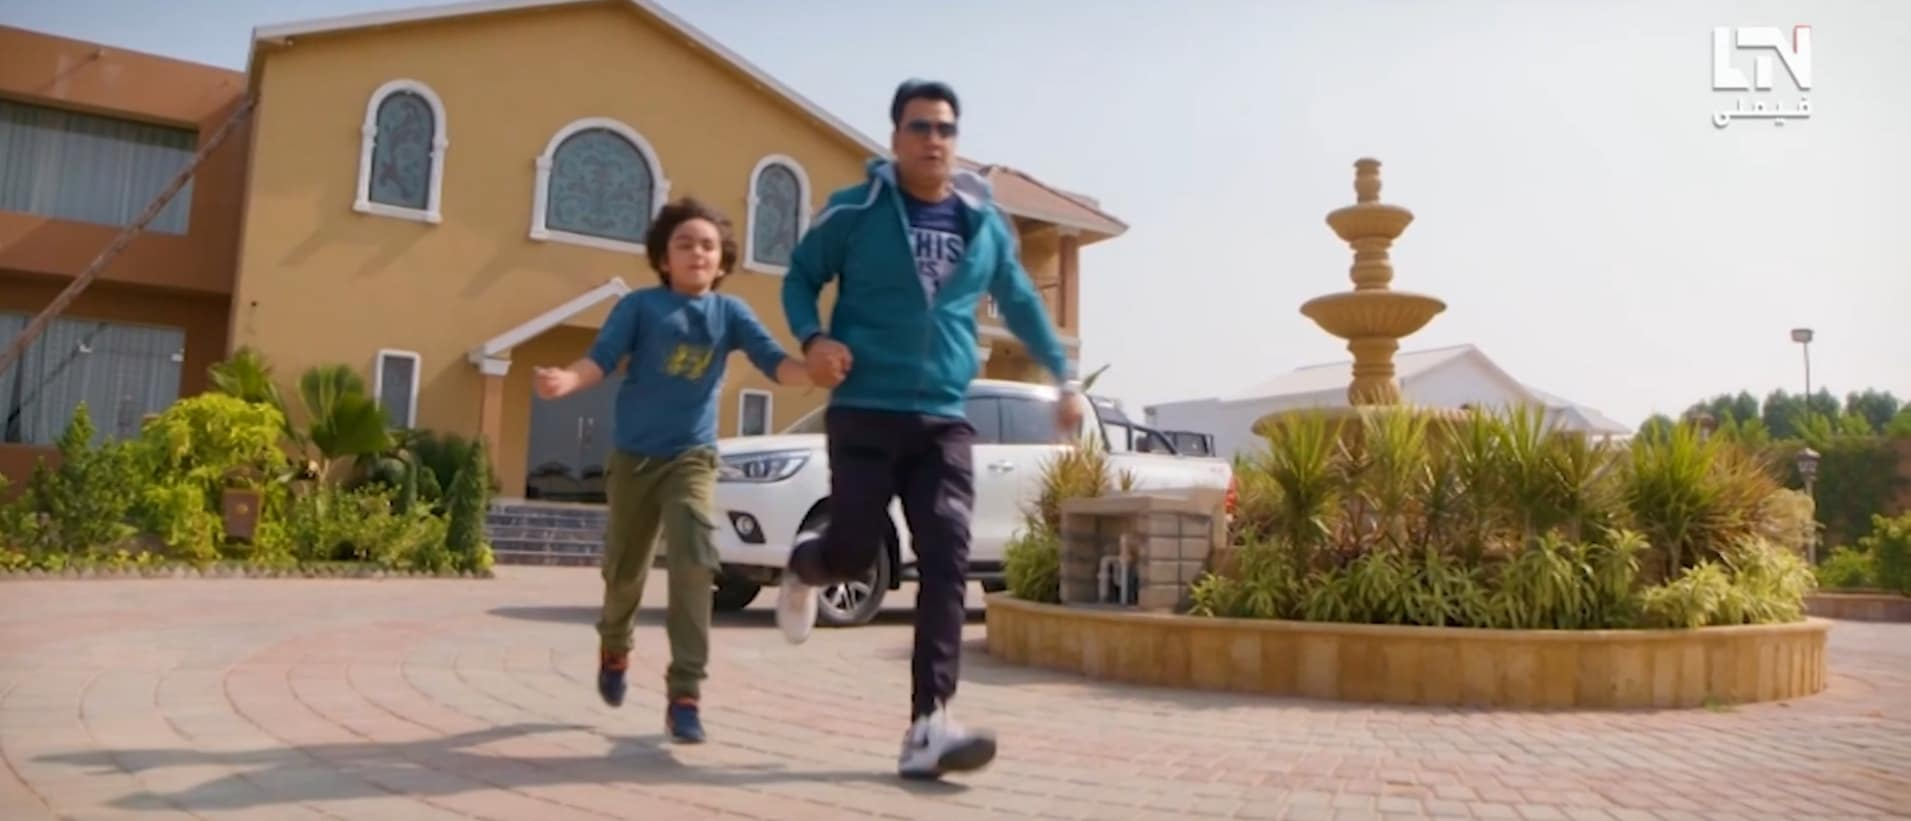 release date of Rung Do Rangi Movie